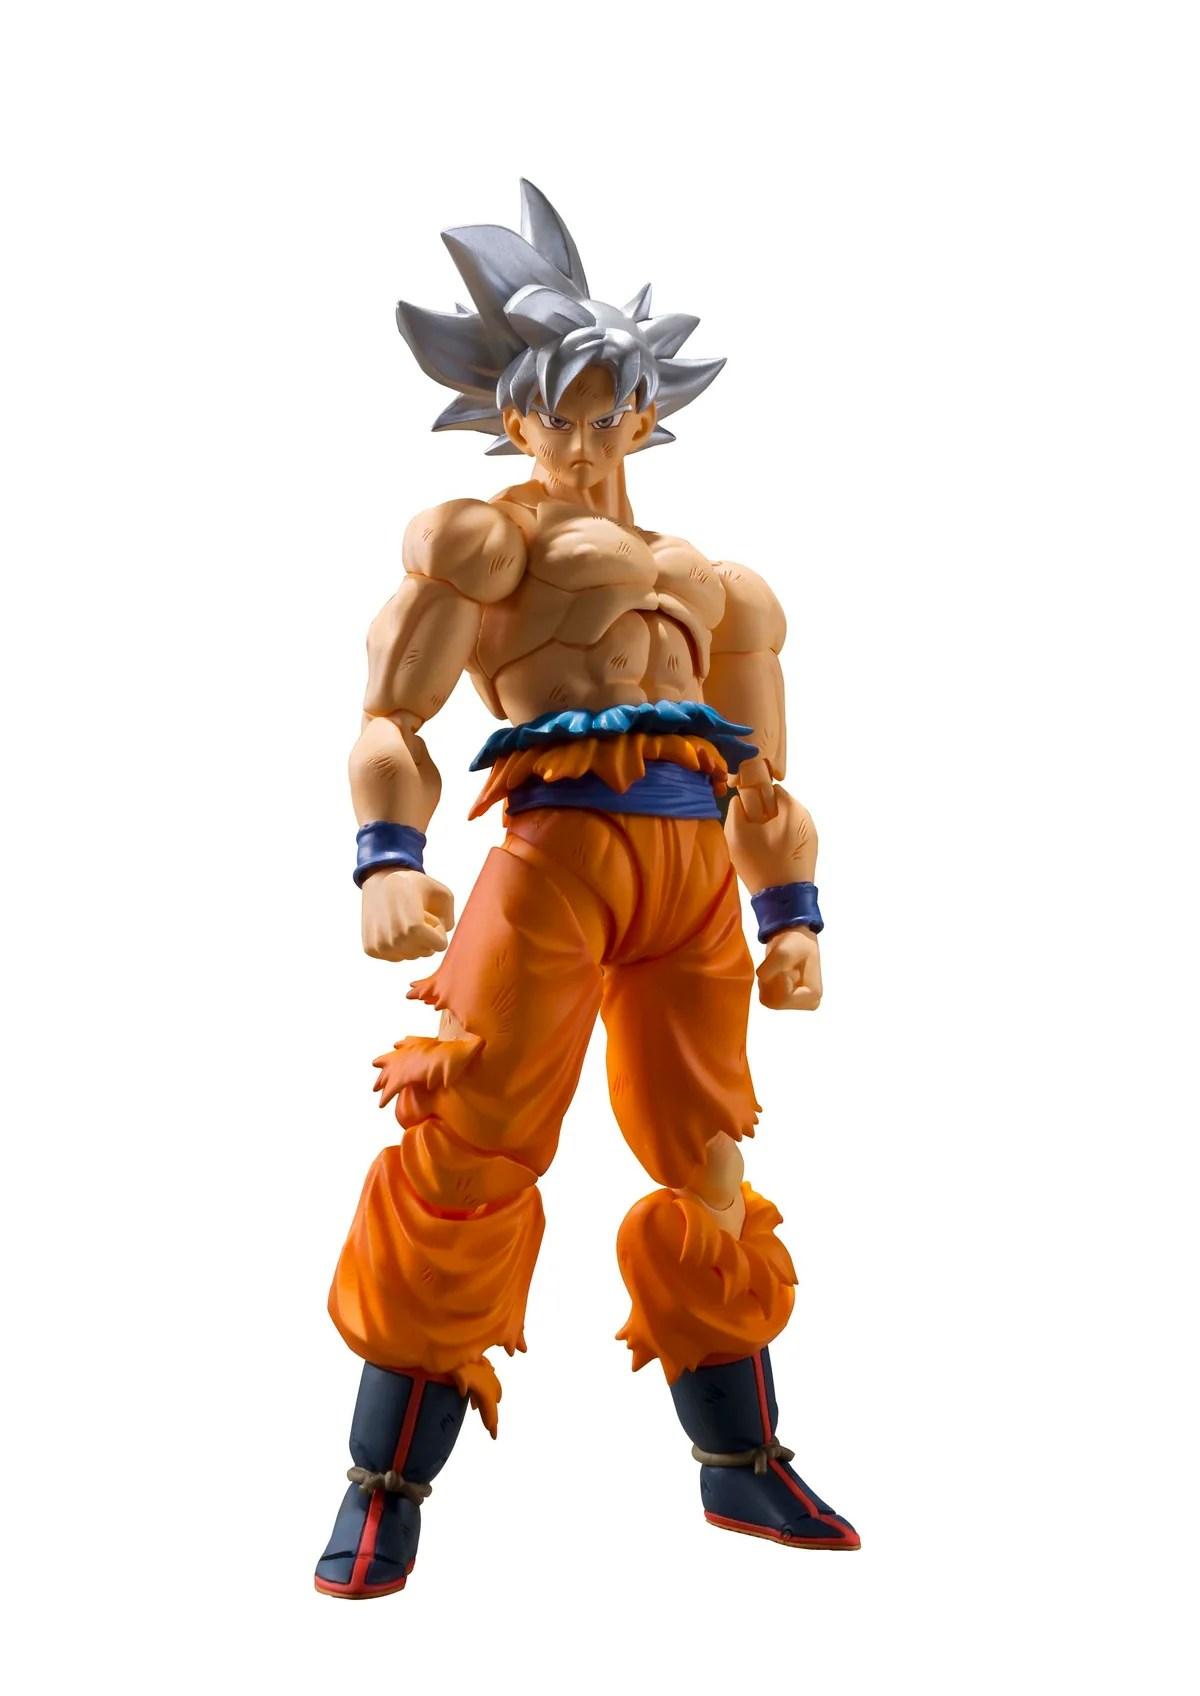 Dragon Ball Super Goku Ultra Instinct : dragon, super, ultra, instinct, Bandai, Tamashii, Nations, Dragon, Super, Ultra, Instinct